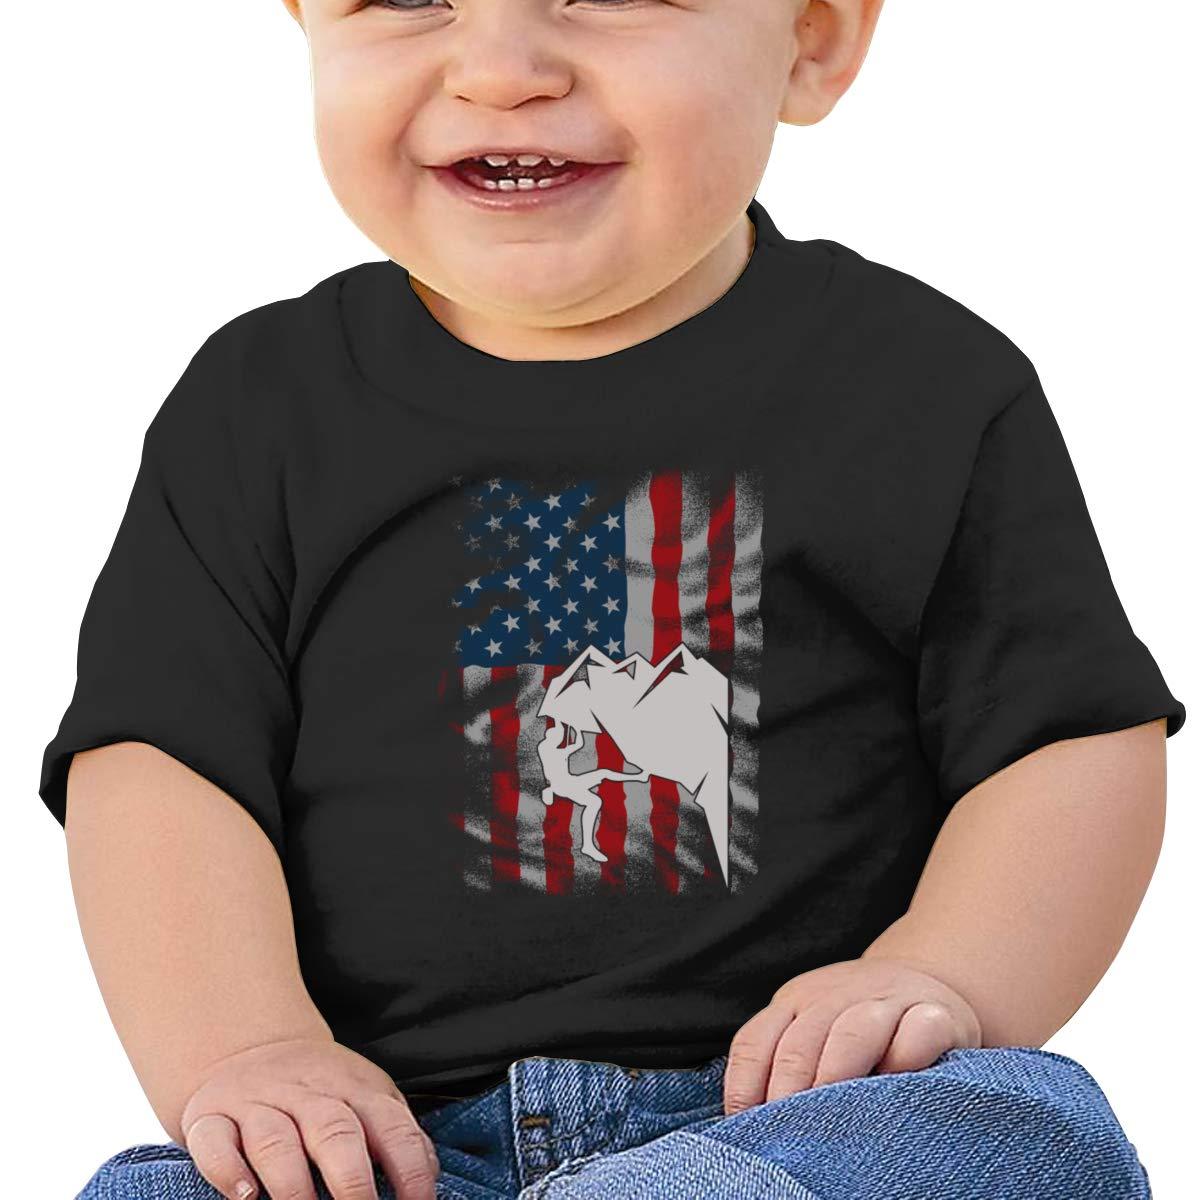 USA Rock Climbing Short Sleeves T Shirt Baby Boys